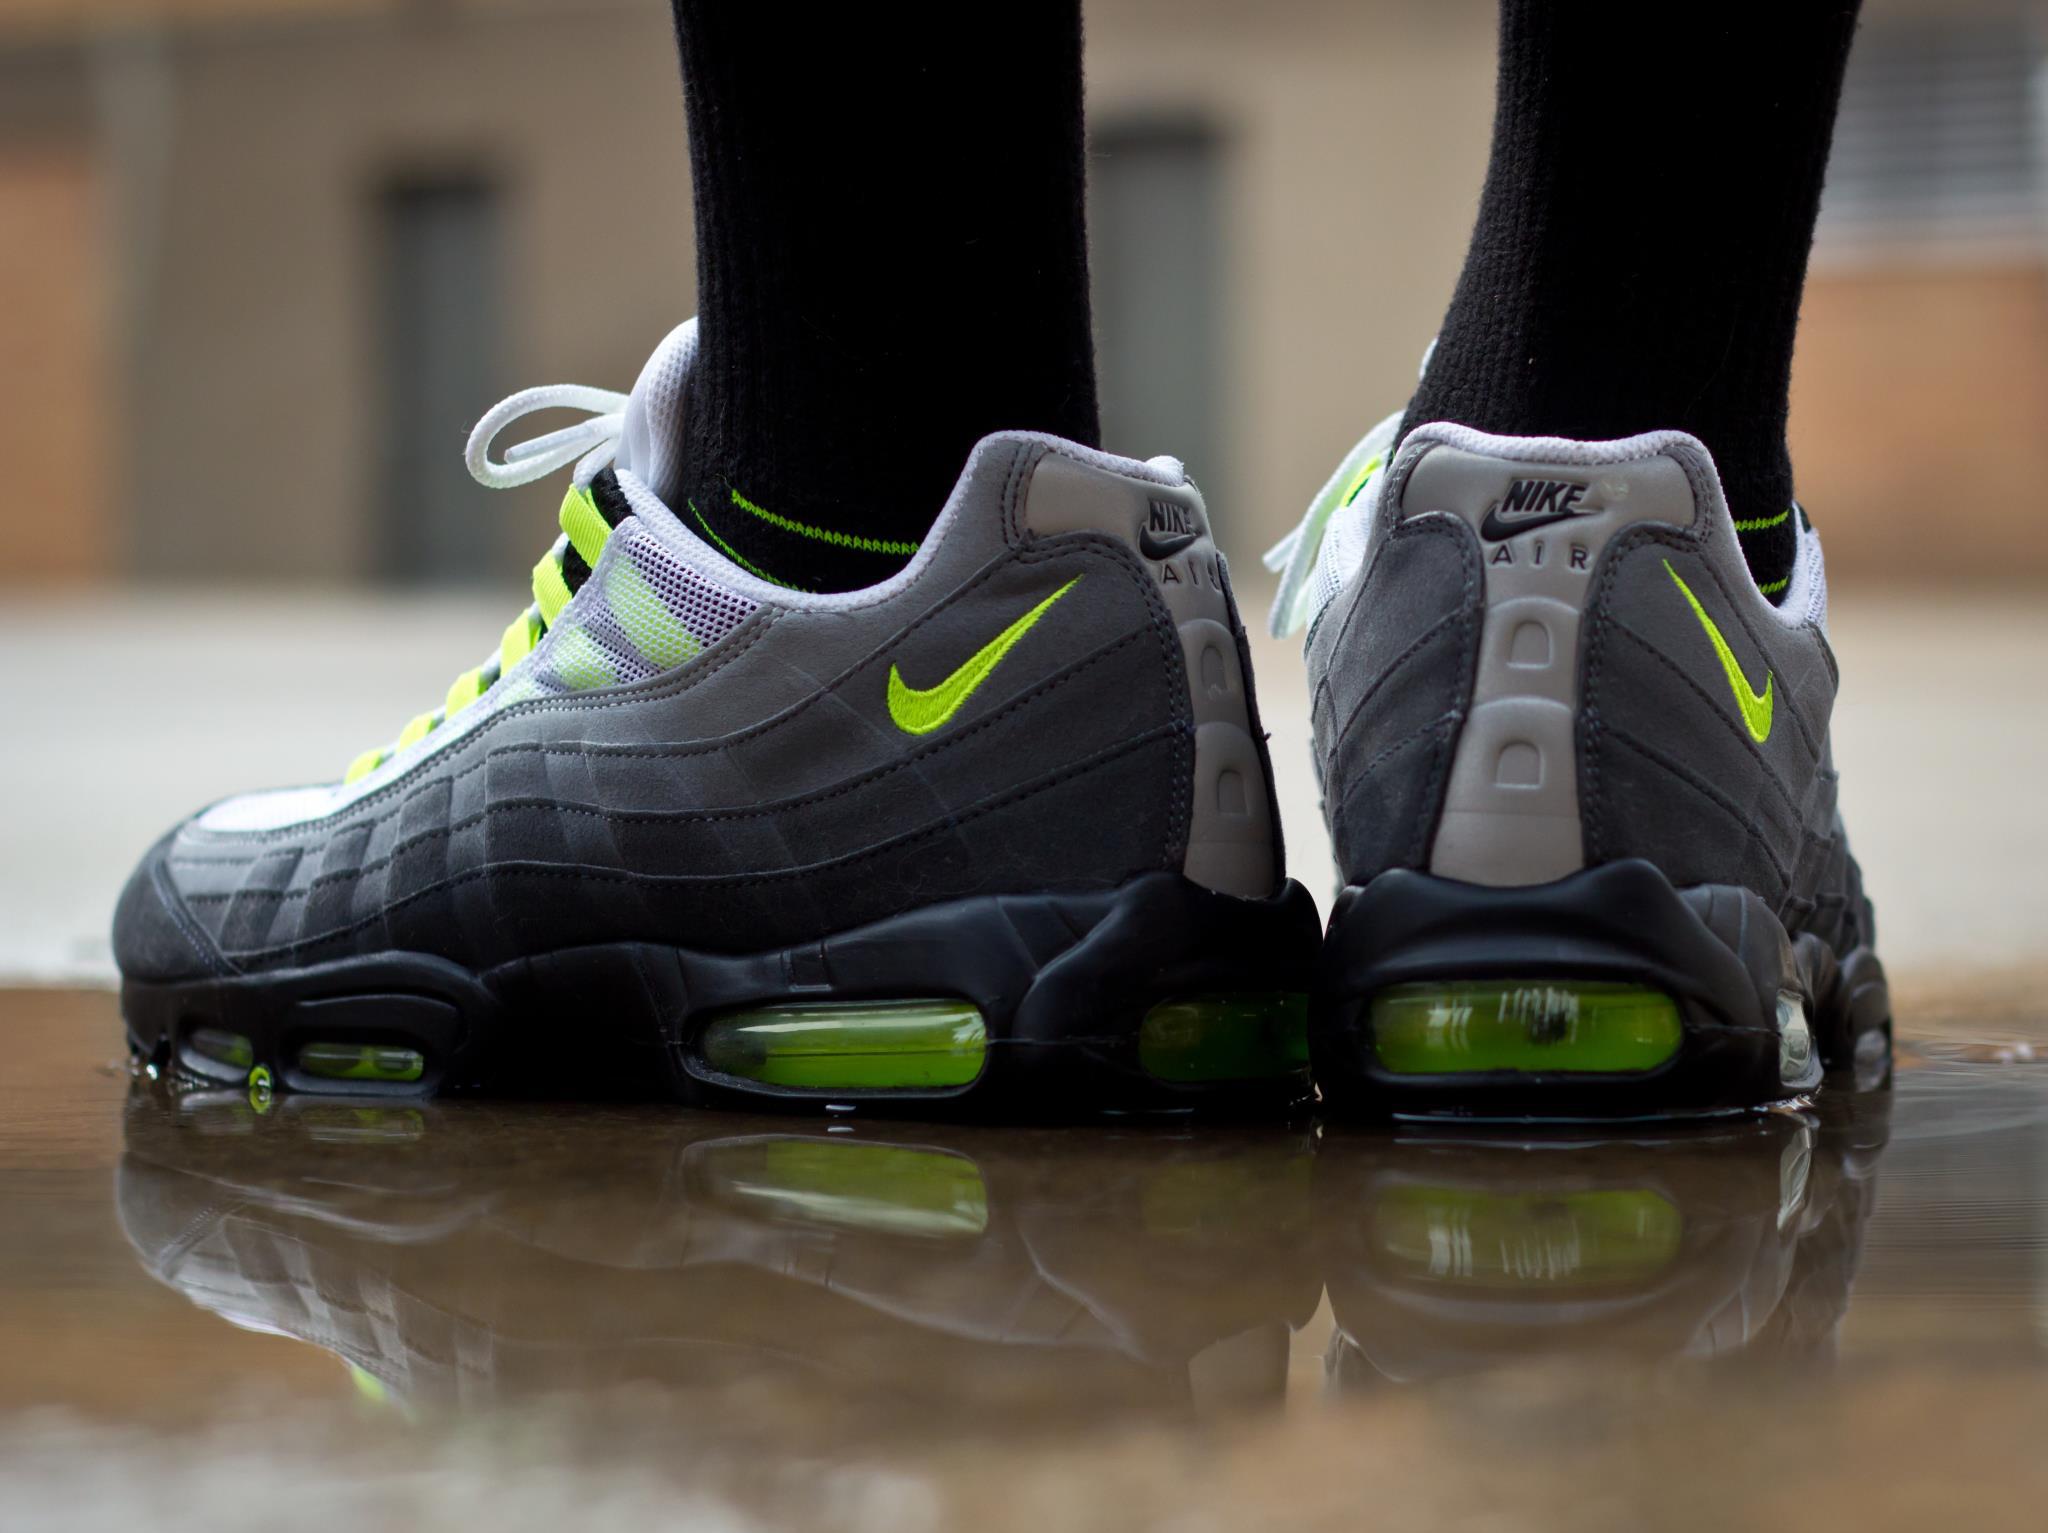 Nike-Air-Max-95-OG